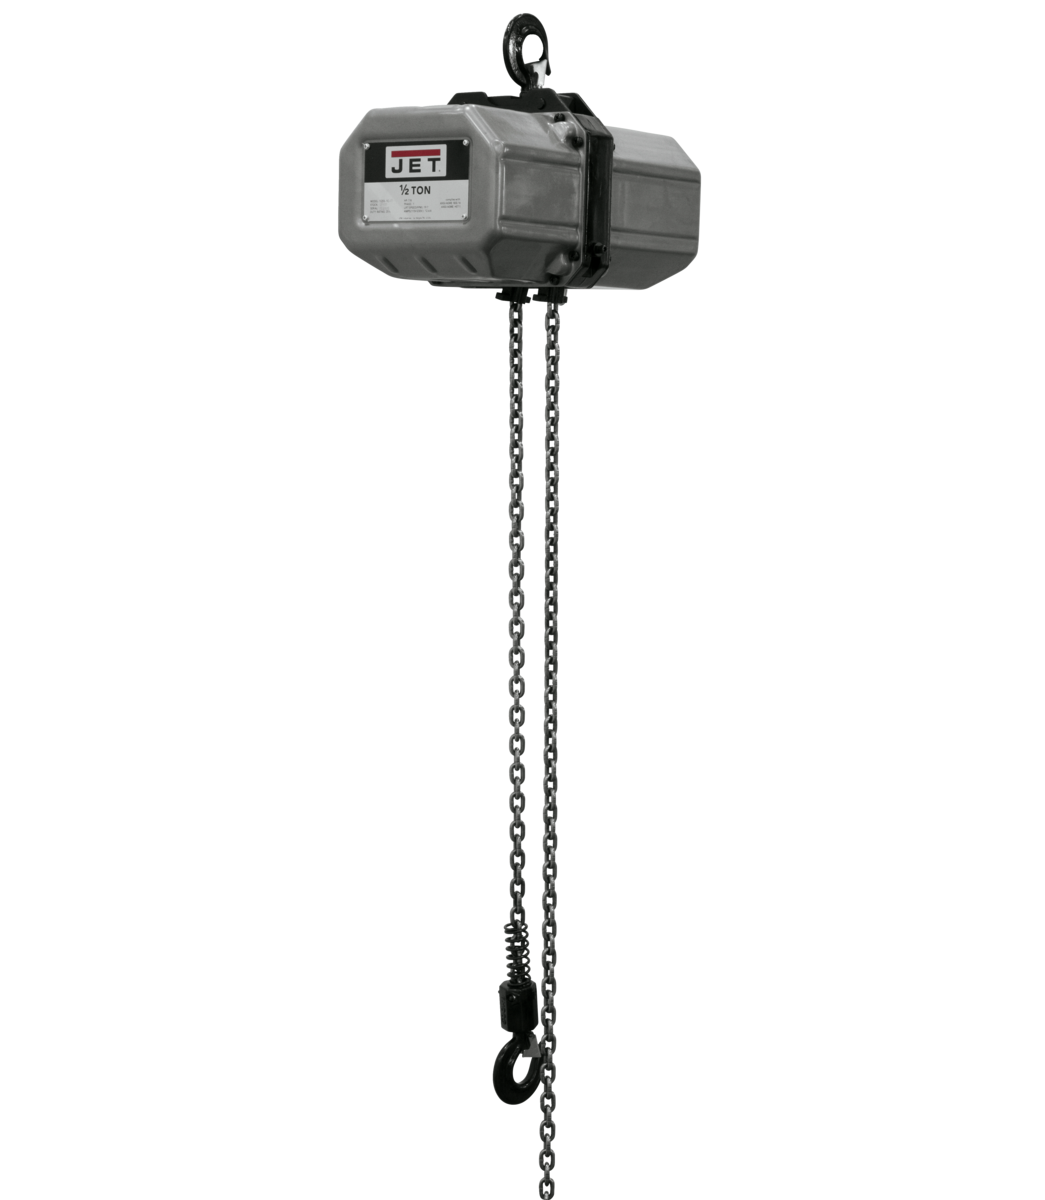 1/2SS-3C-20, 1/2-Ton Electric Chain Hoist 3-Phase 20' Lift